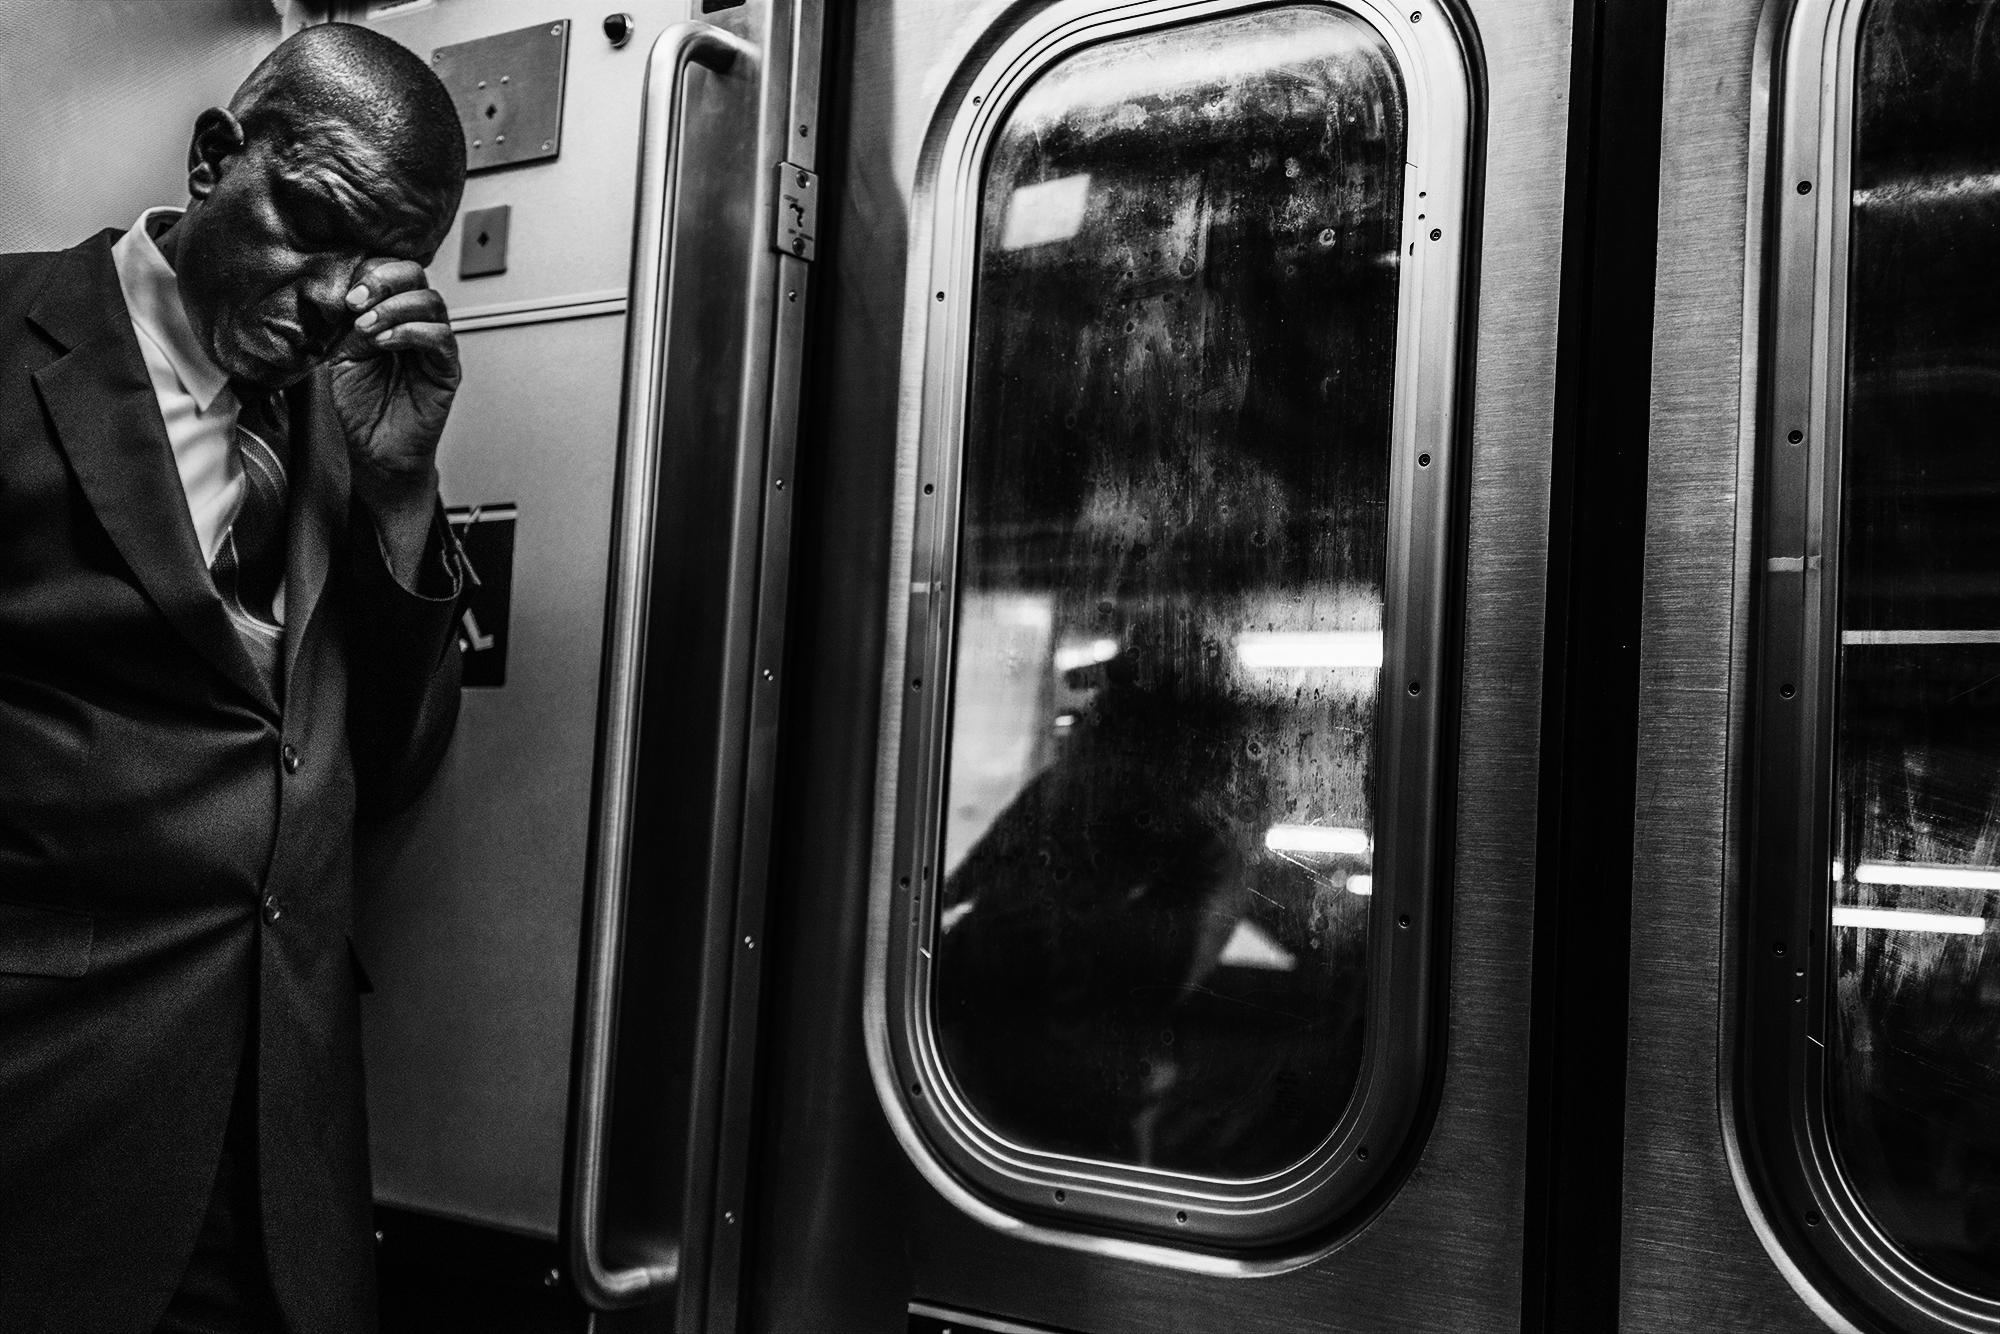 NYC_Subway_Solum_BlackMan_2017-003.jpg